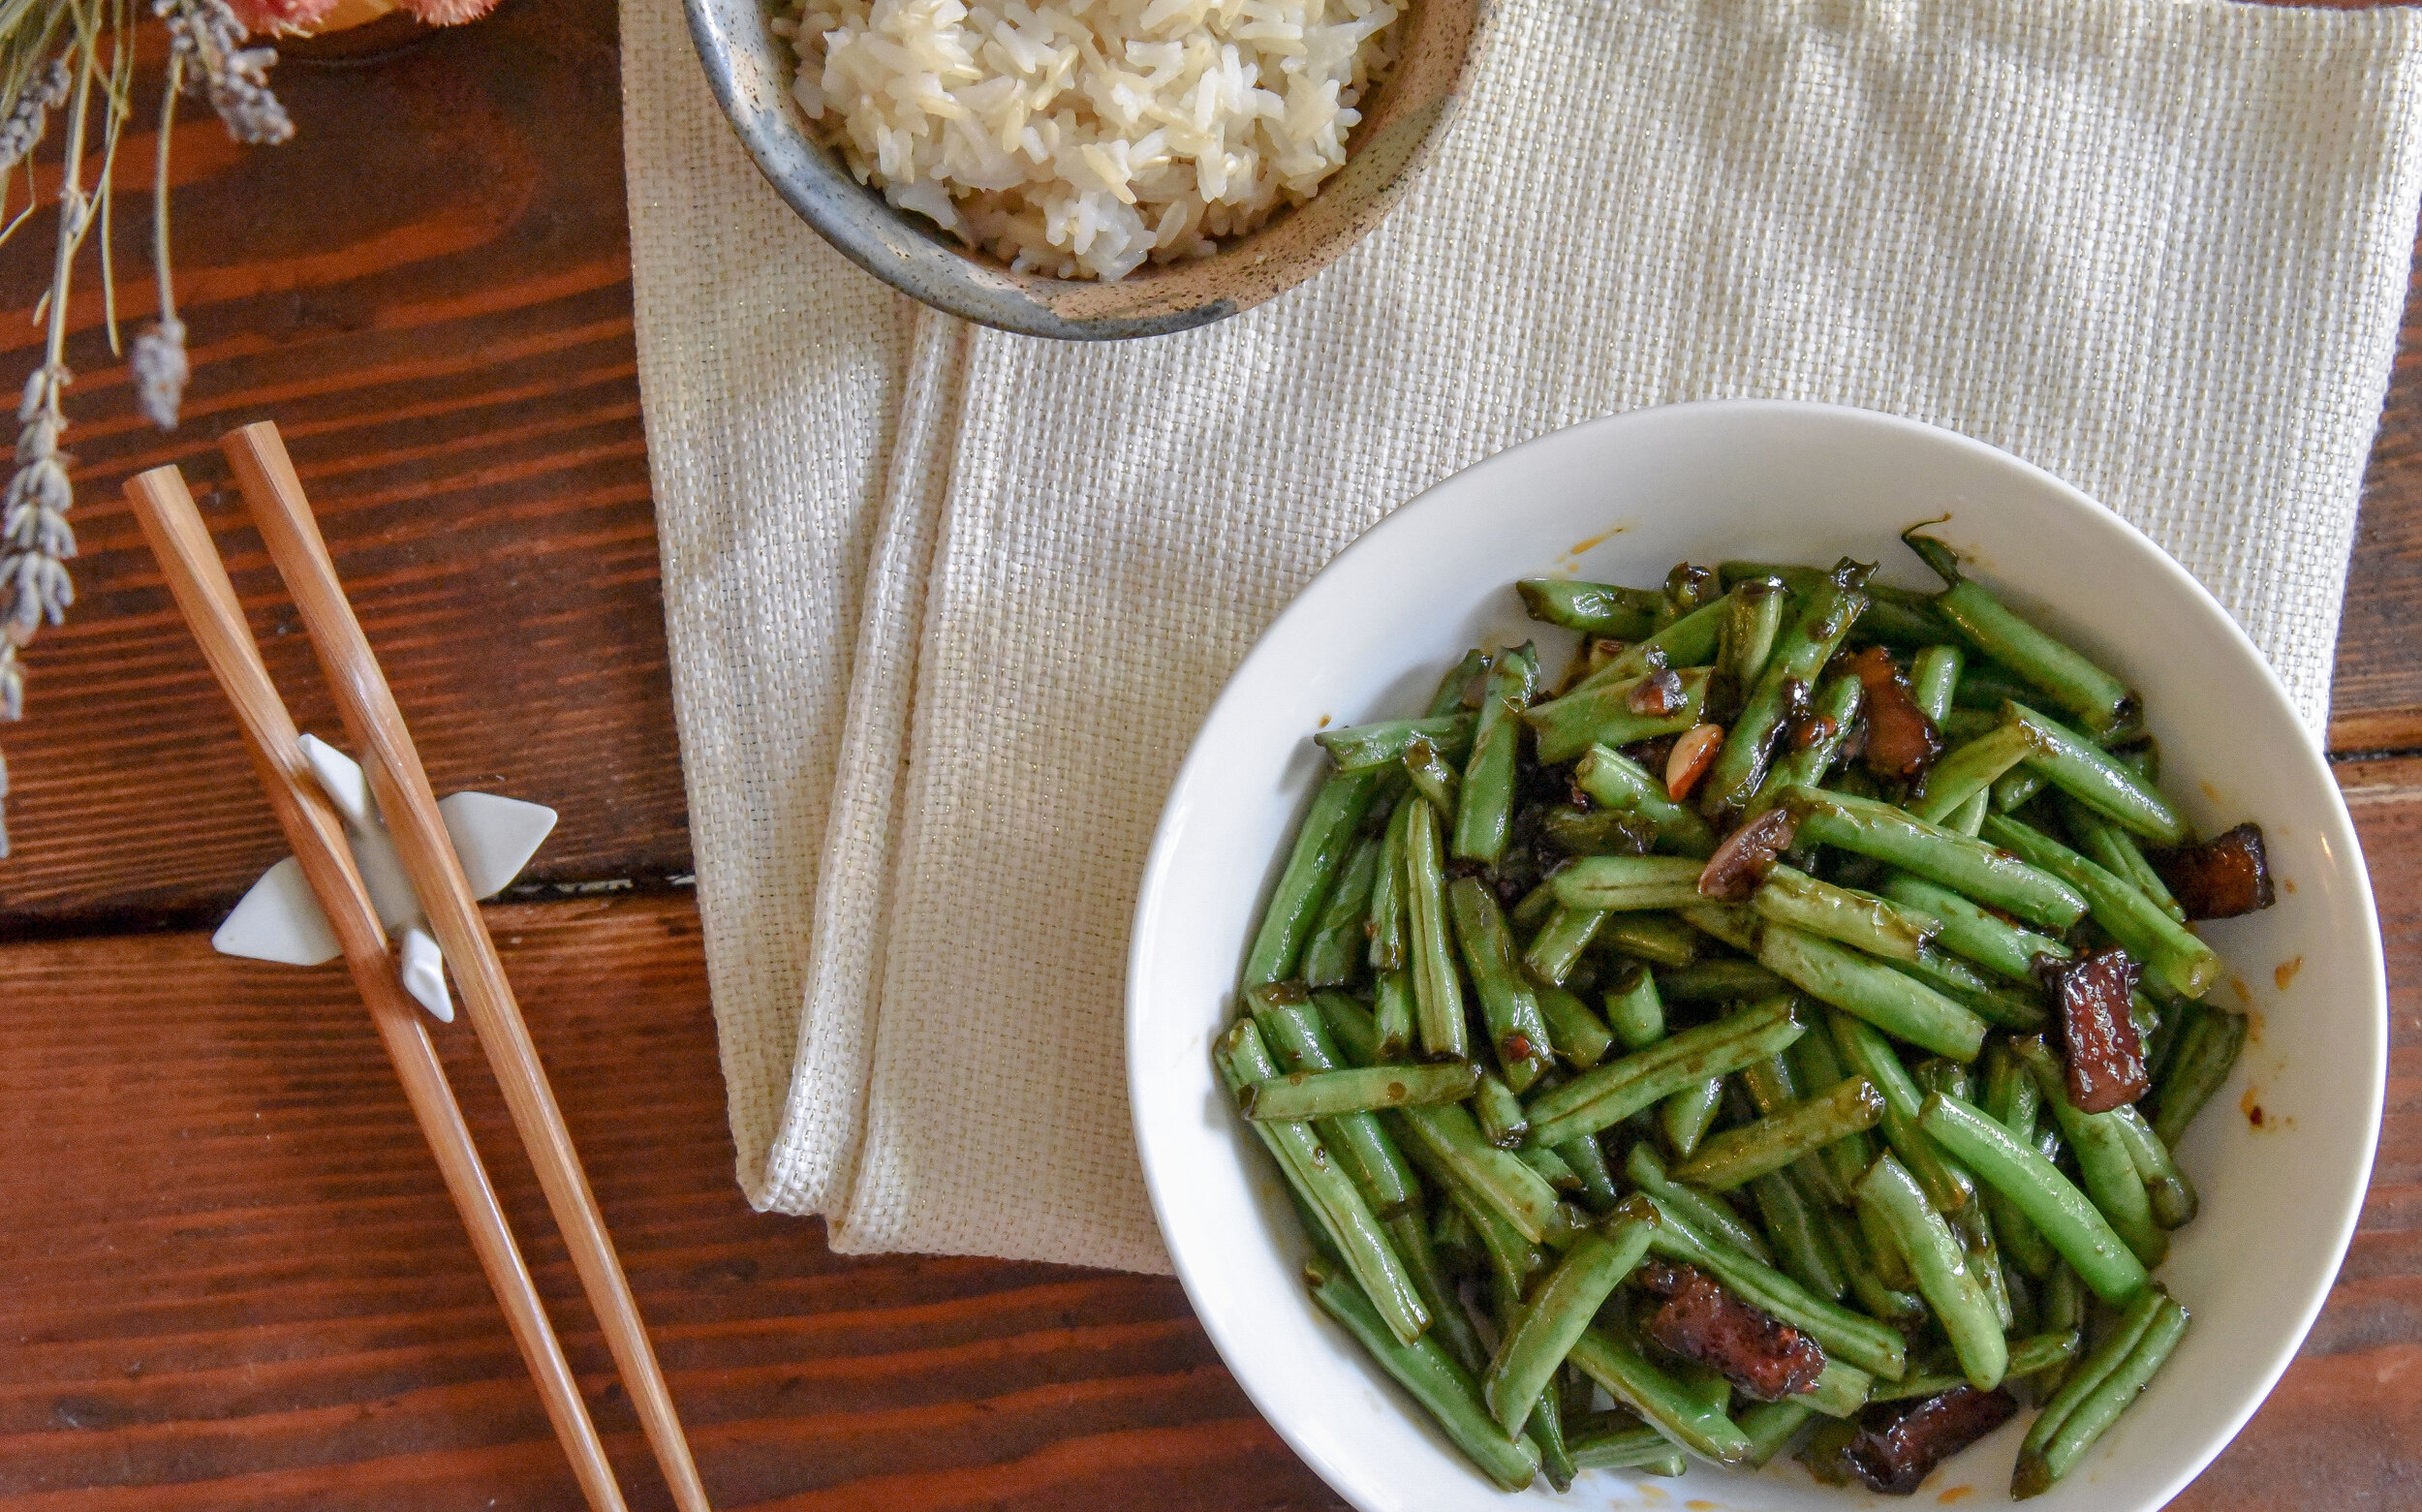 Chinese stir fry green beans